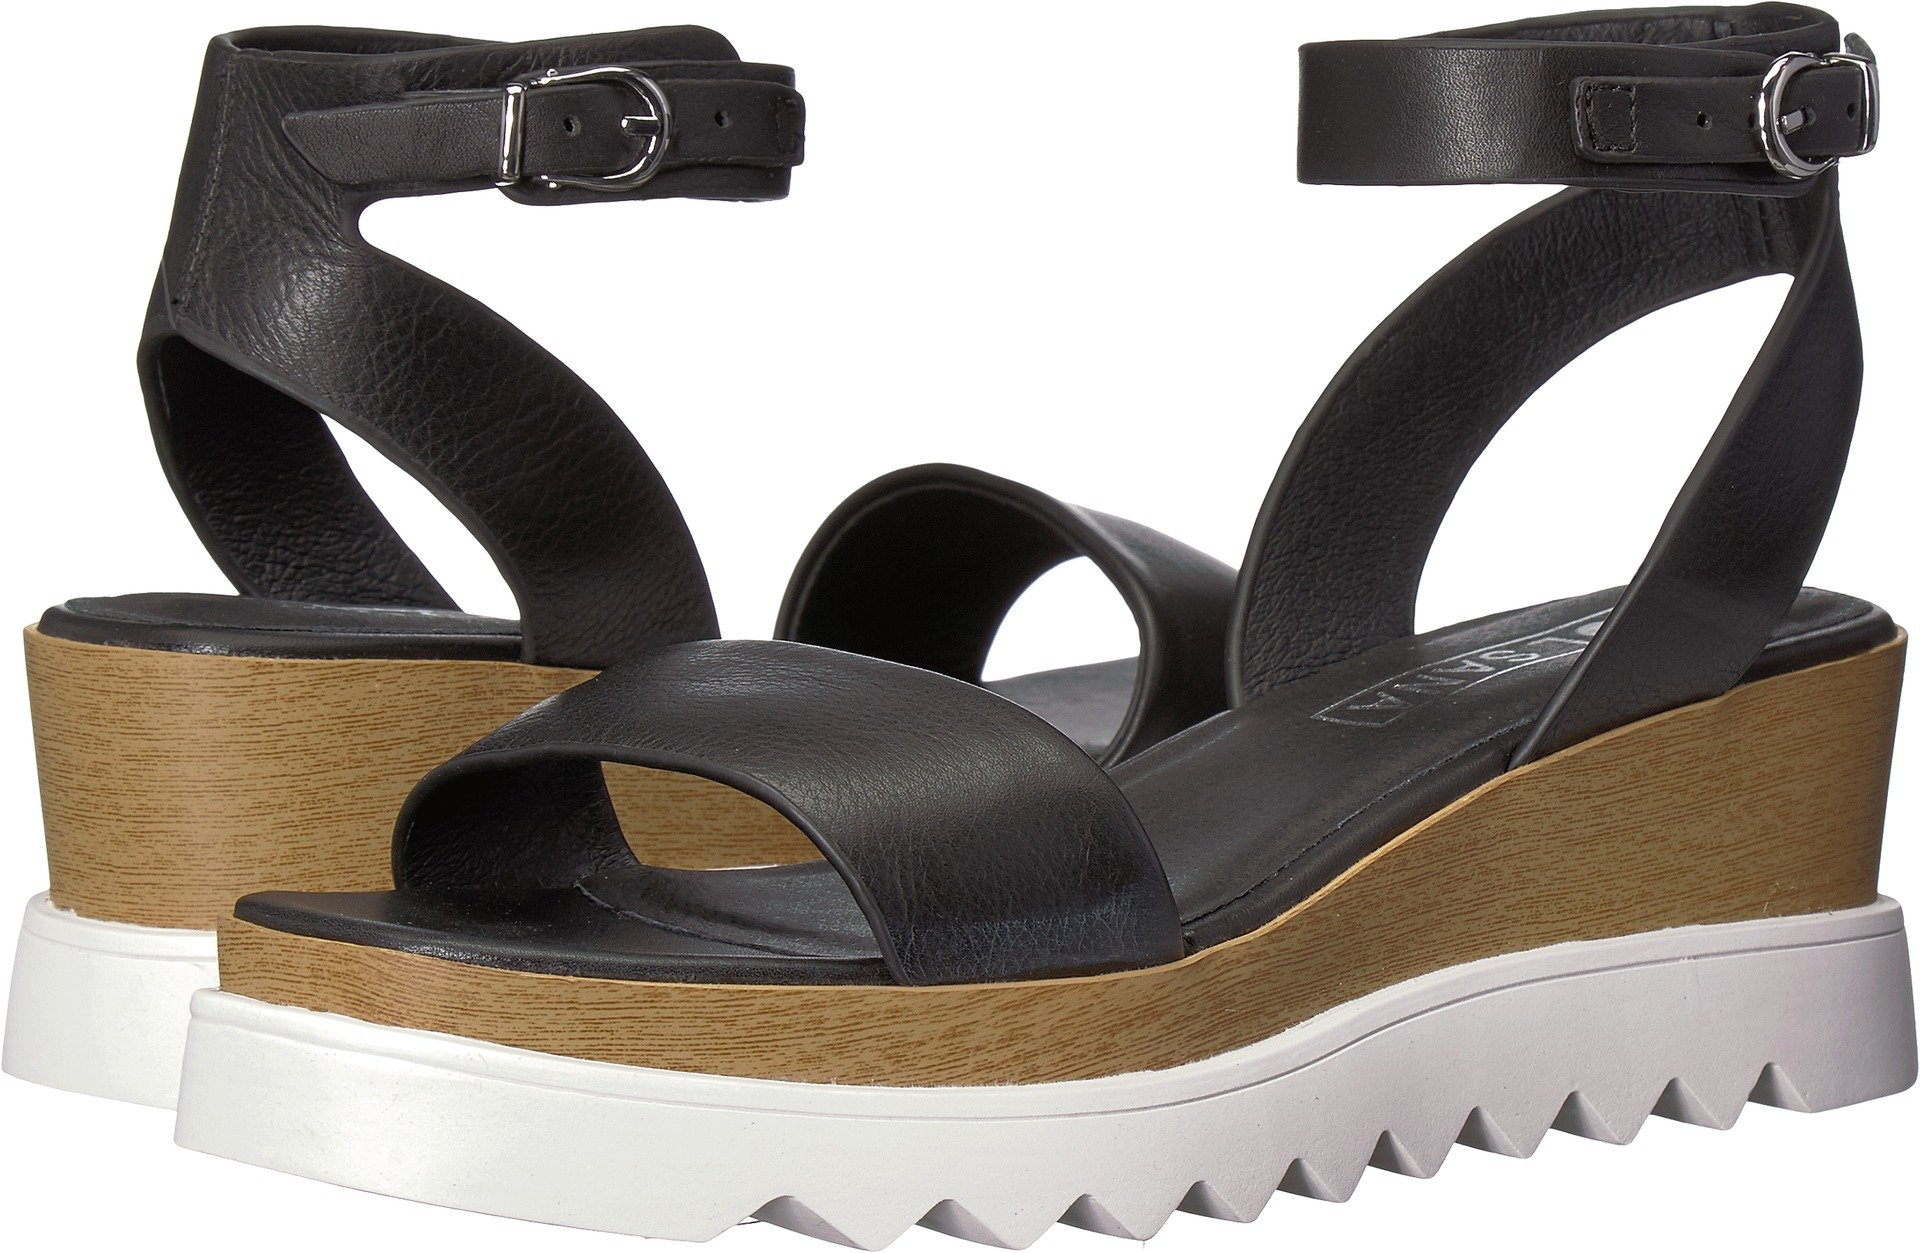 Sol Sana Women's Tray Wedge Sandal Black 2 38 M EU